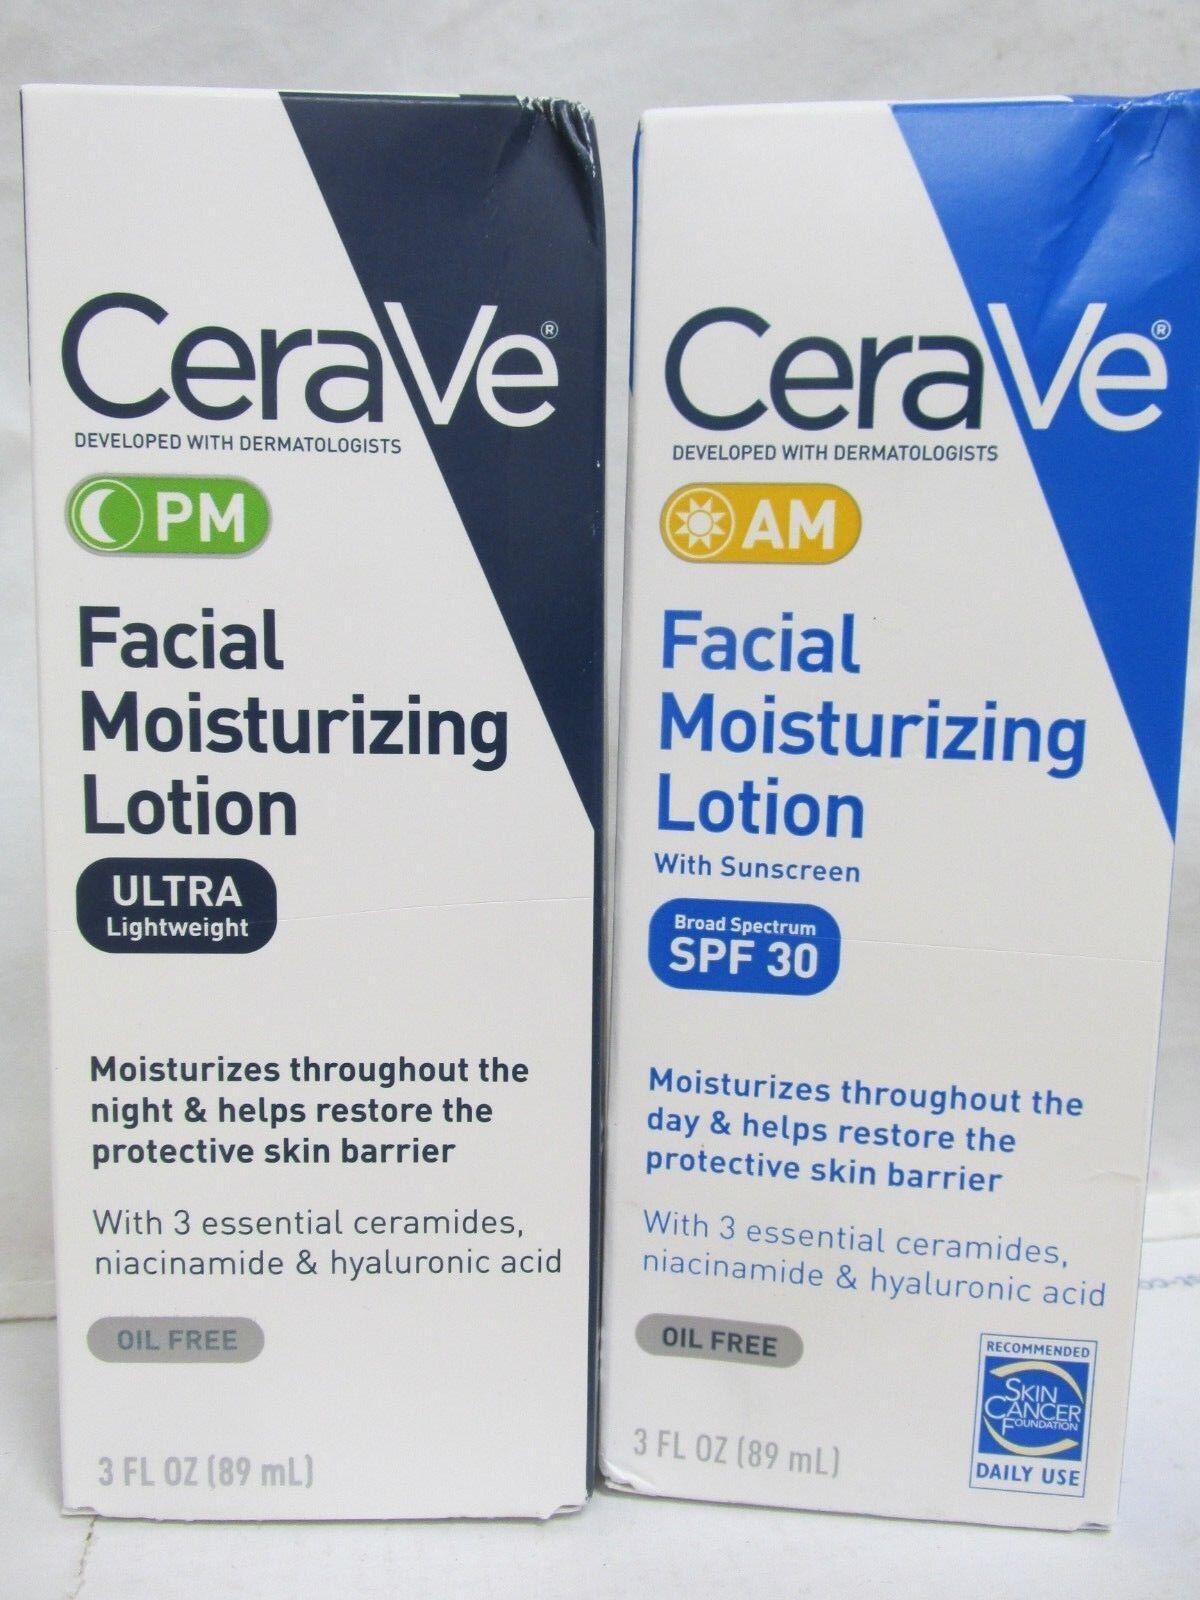 CeraVe PM Moisturizing Night Lotion Face Moisturizer and Cer